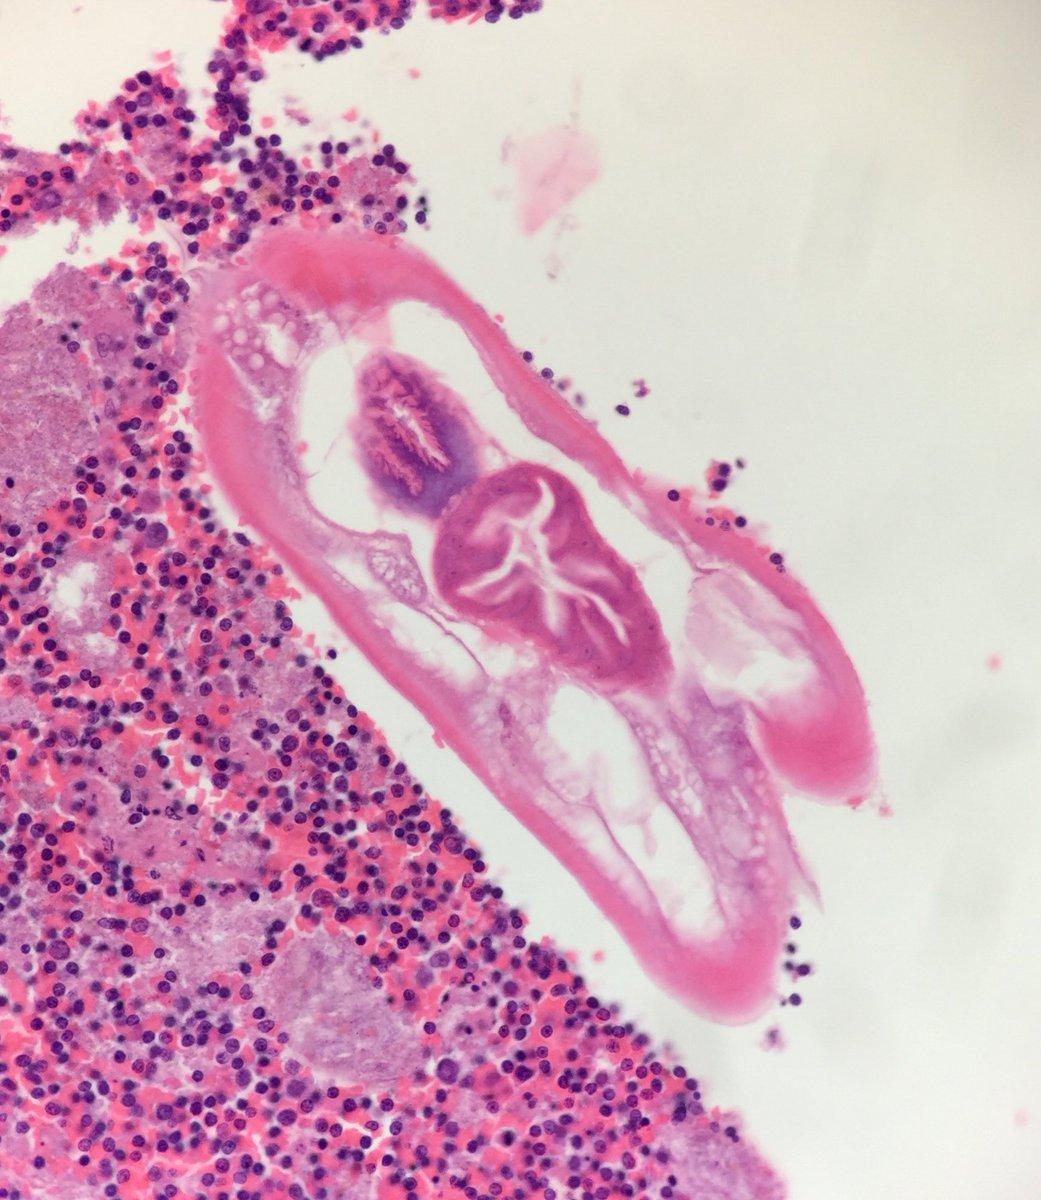 enterobius vermicularis histopathology rectal cancer in 20s